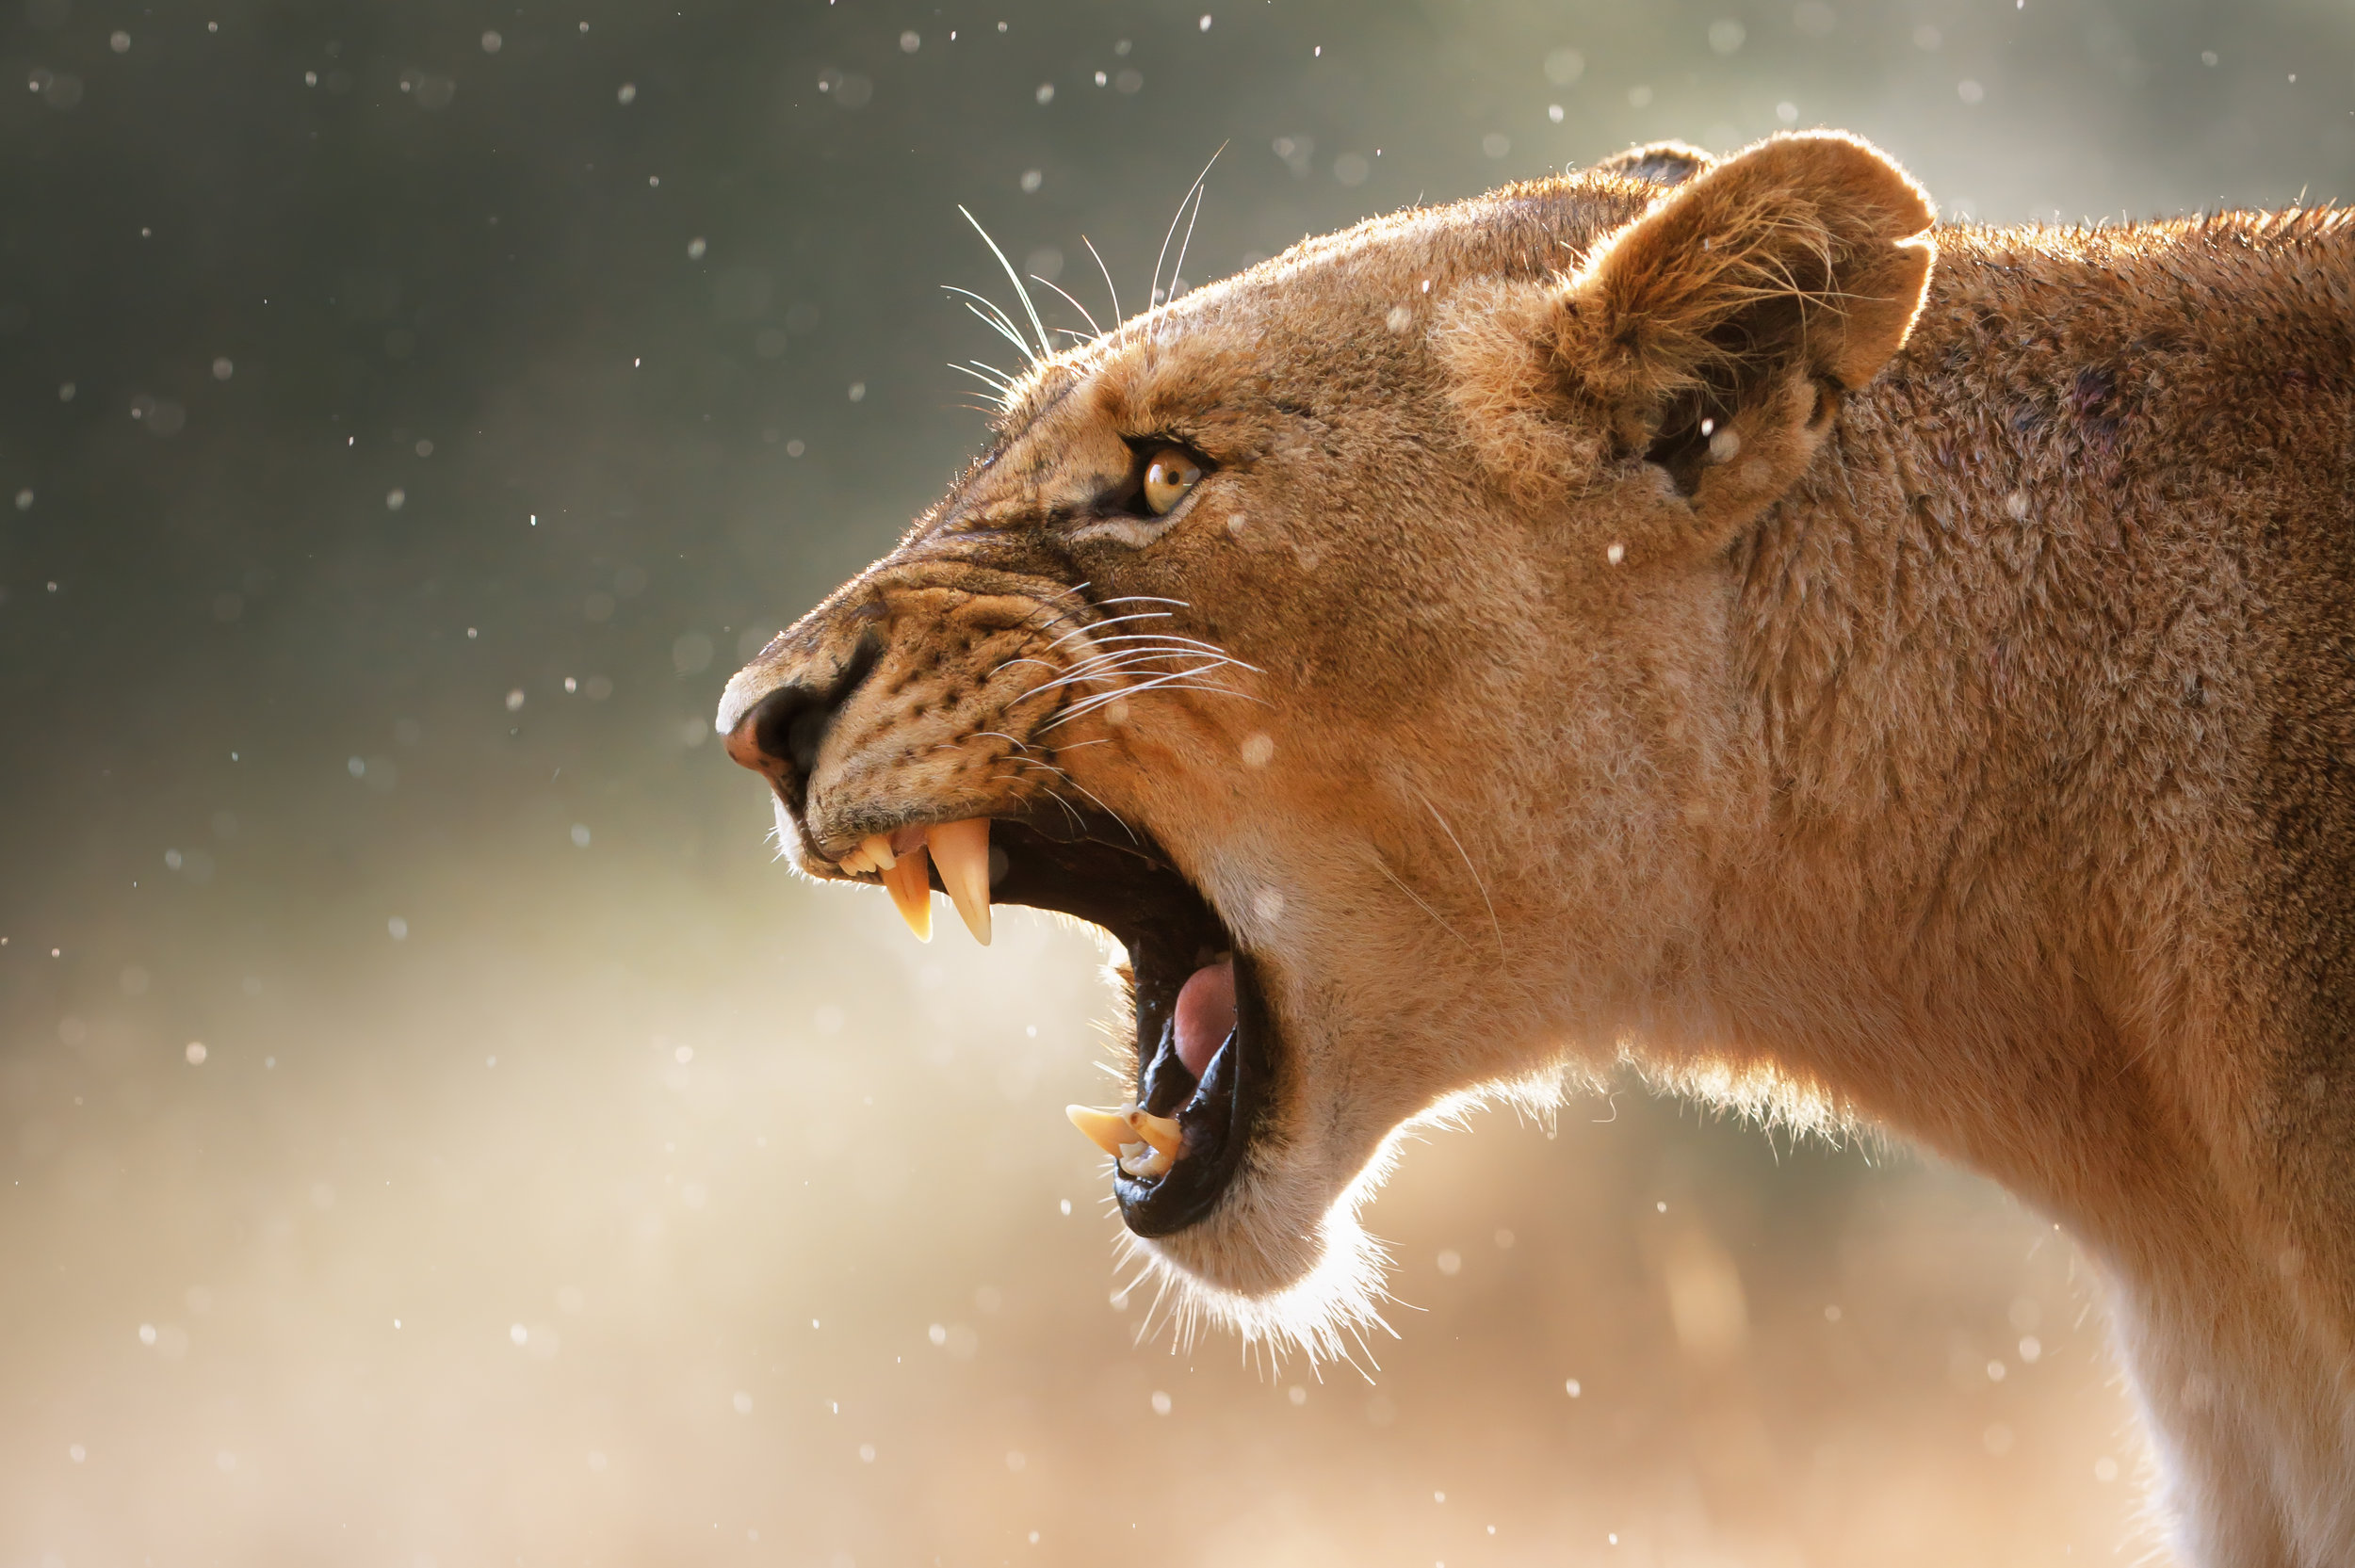 015080jj-lioness-teeth.jpg